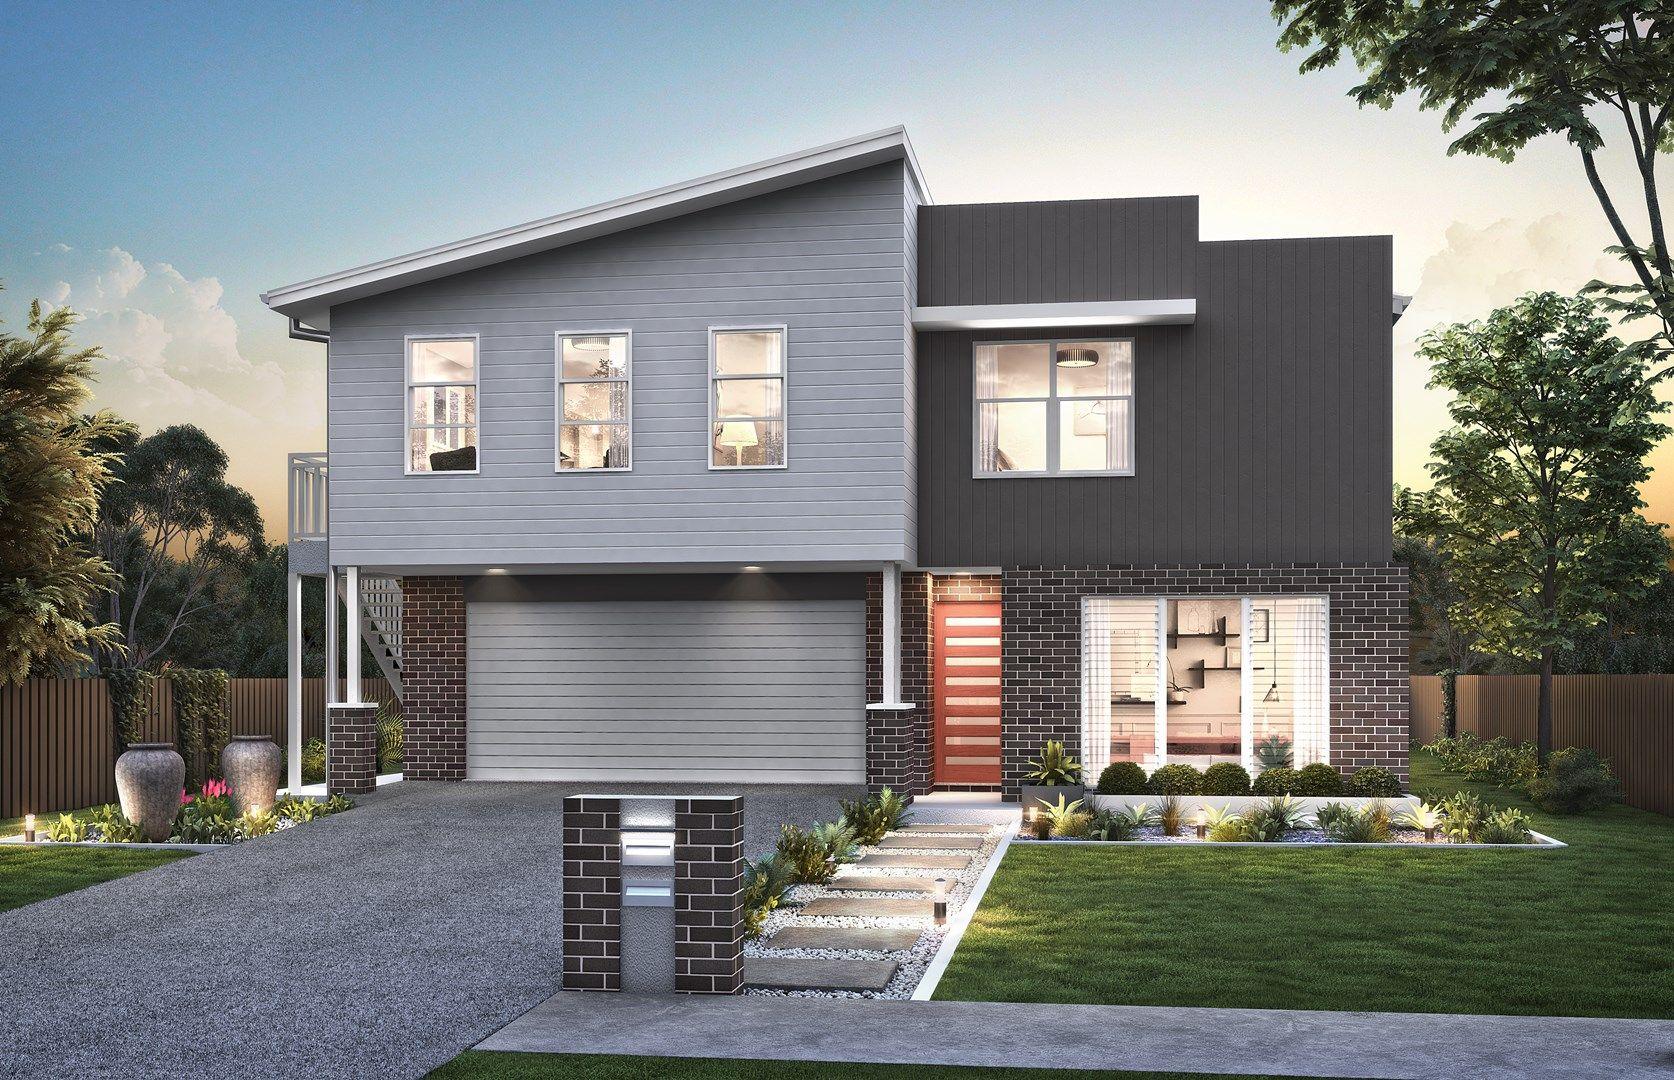 99 - 117 Alawoona Street, Redbank Plains QLD 4301, Image 2